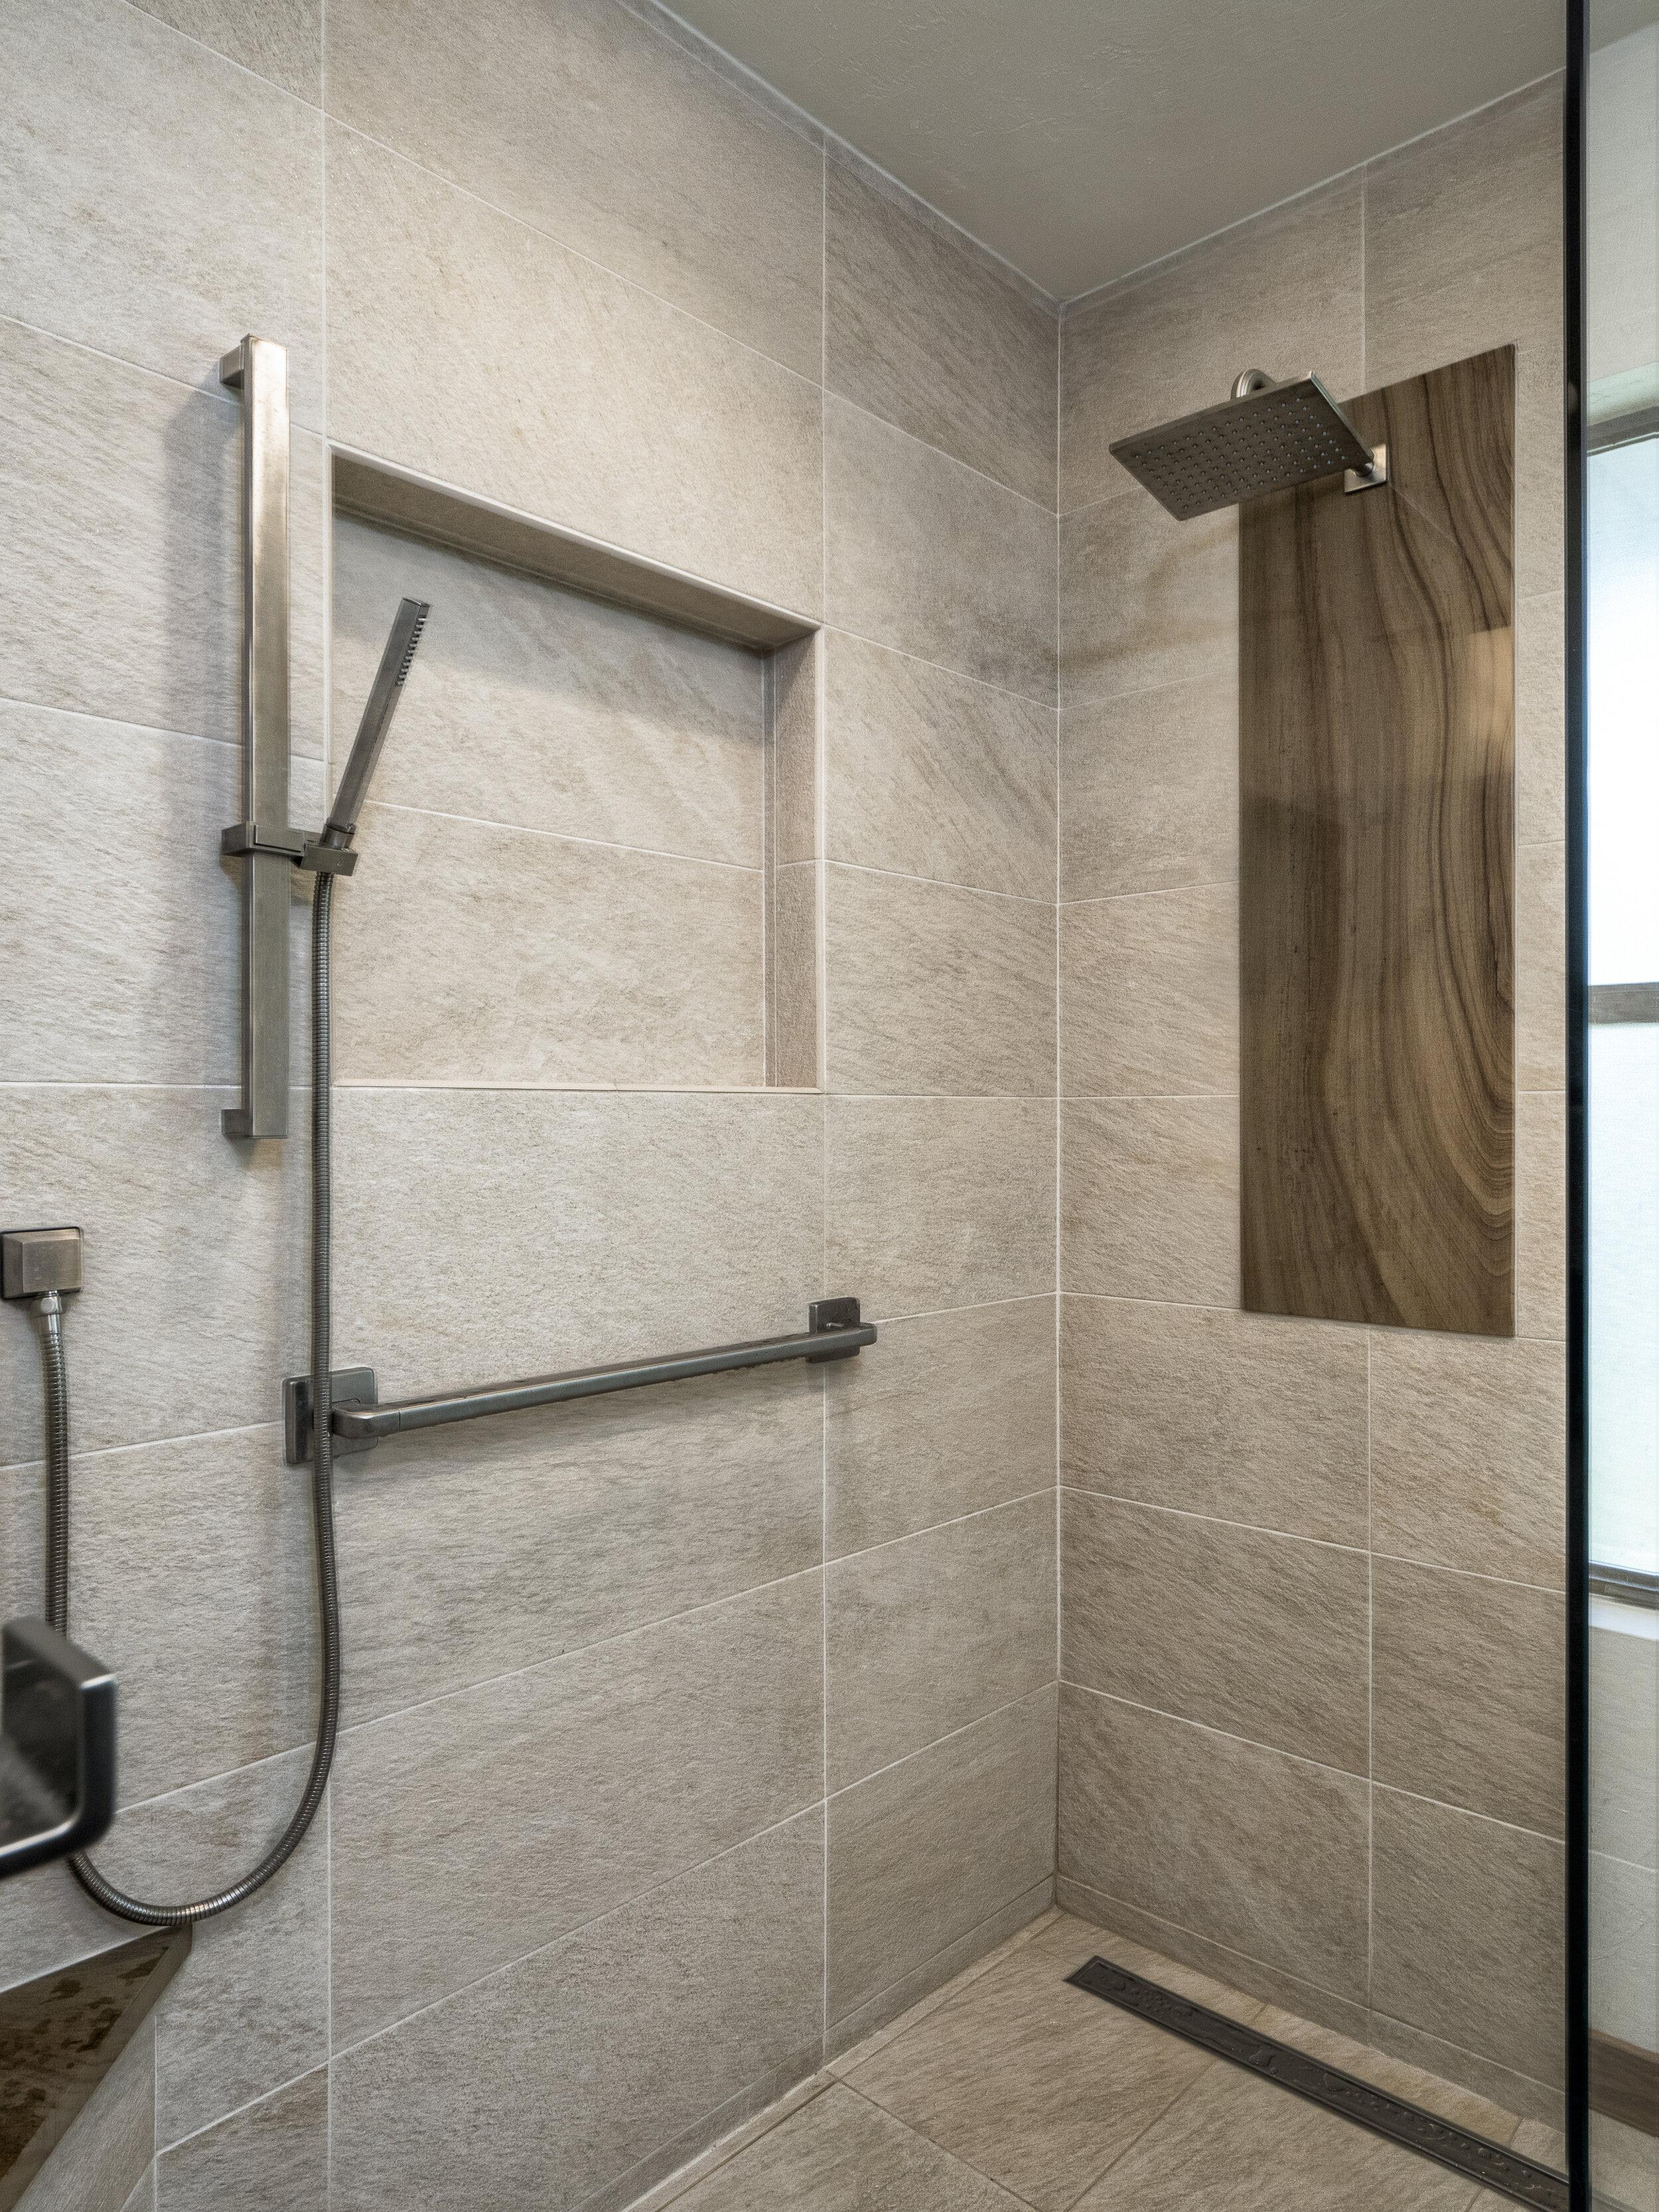 Davenport bath showerheads.jpg